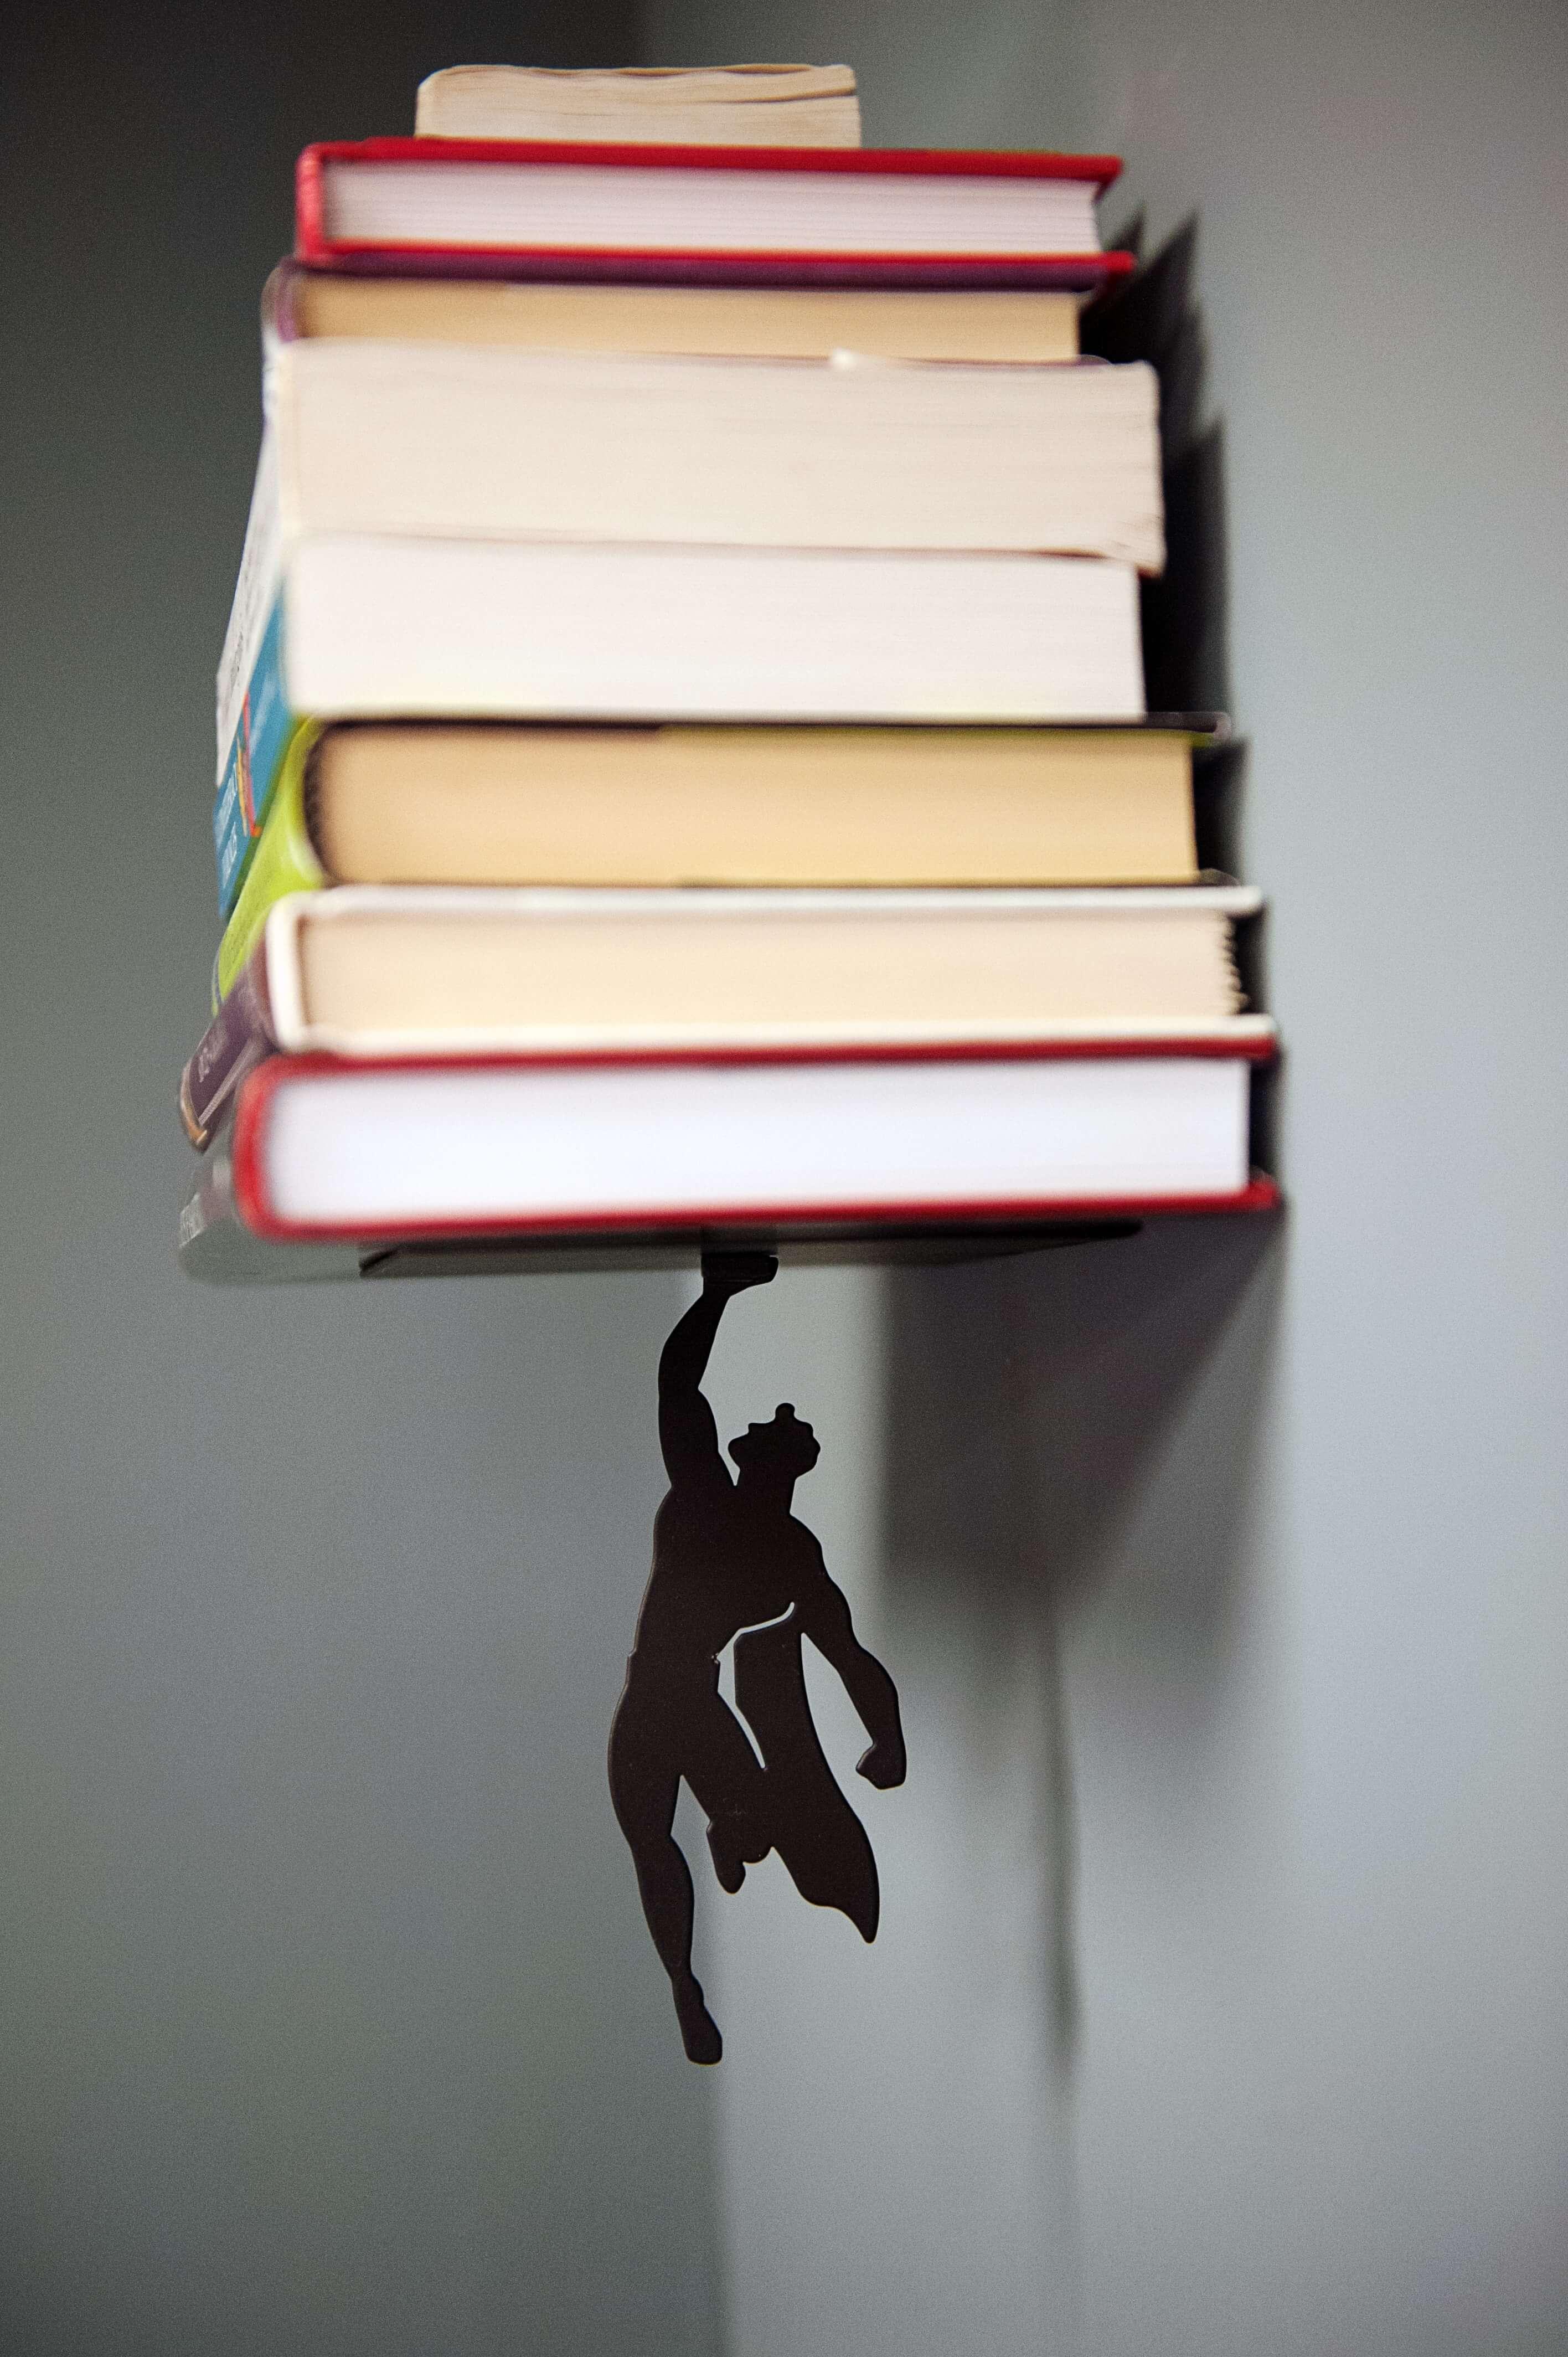 book-case-superhero-flying